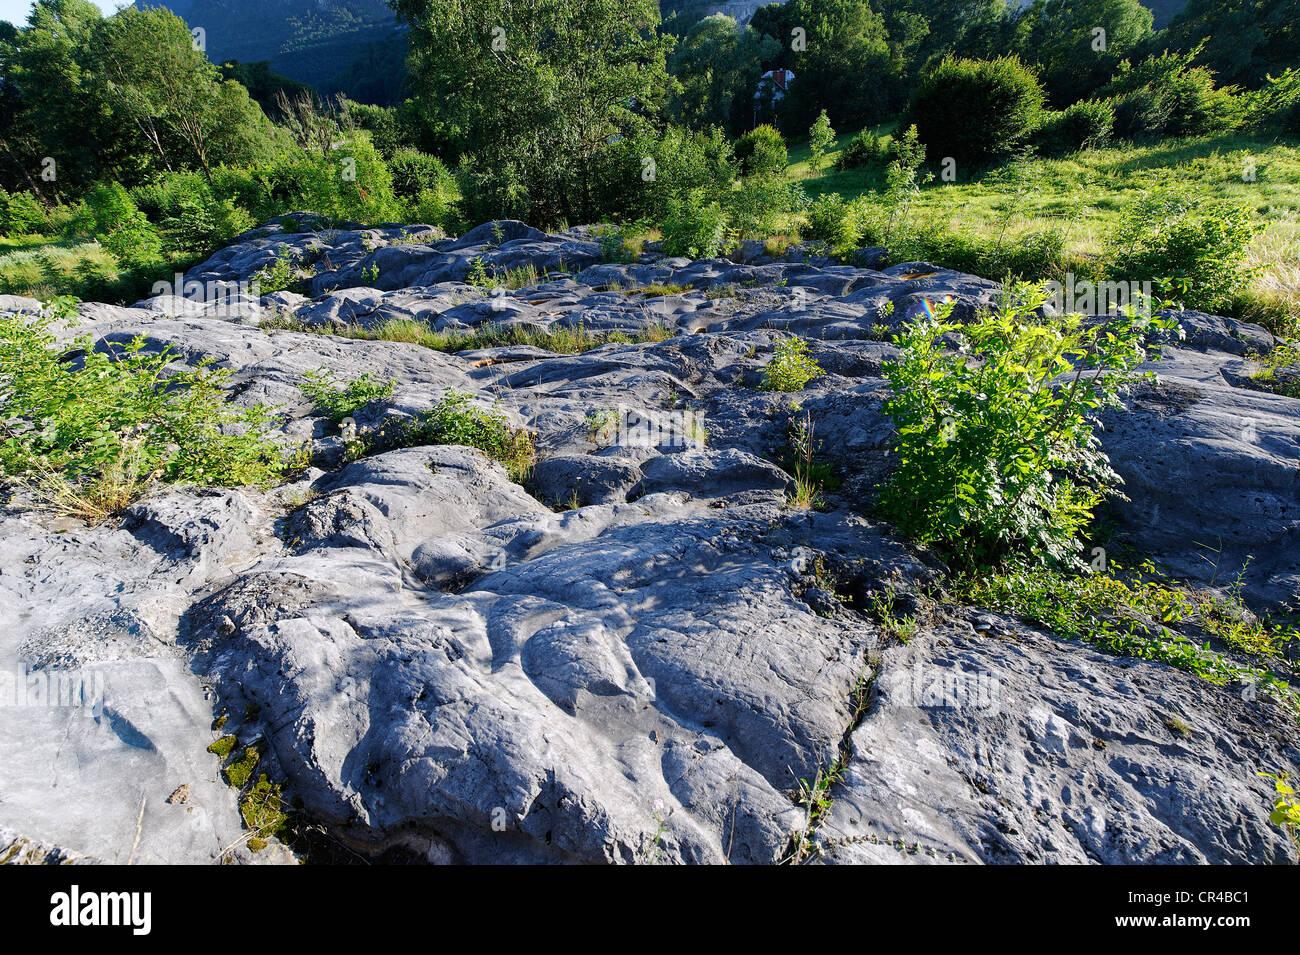 Glacial striation patterns on rocks, Fischbach, Flintsbach, Upper Bavaria, Bavaria, Germany, Europe - Stock Image